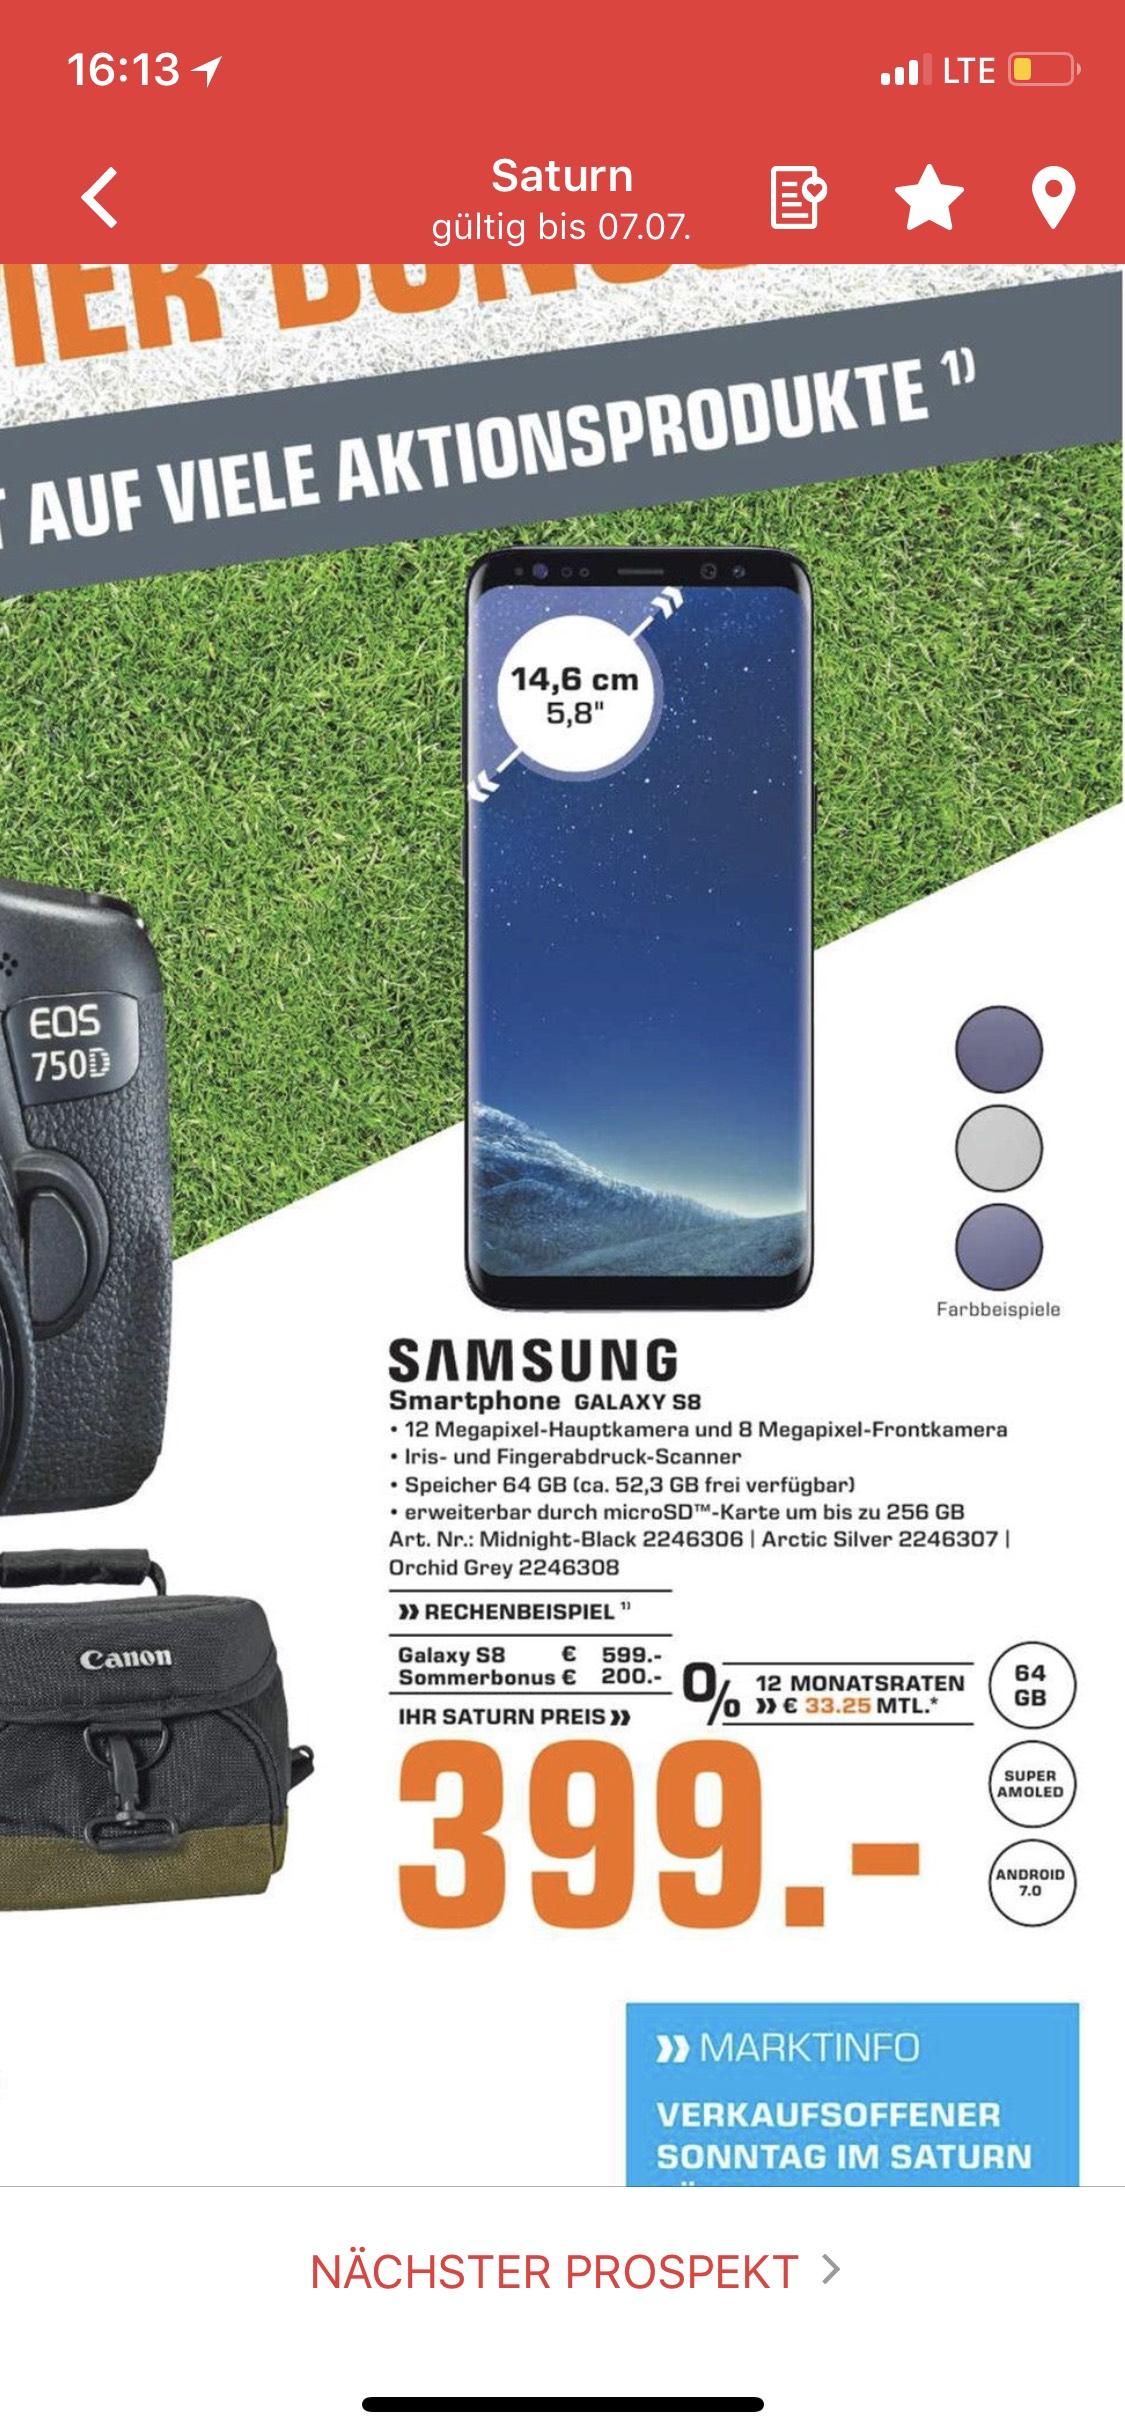 [Saturn Nürnberg] Samsung Galaxy S8 Smartphone